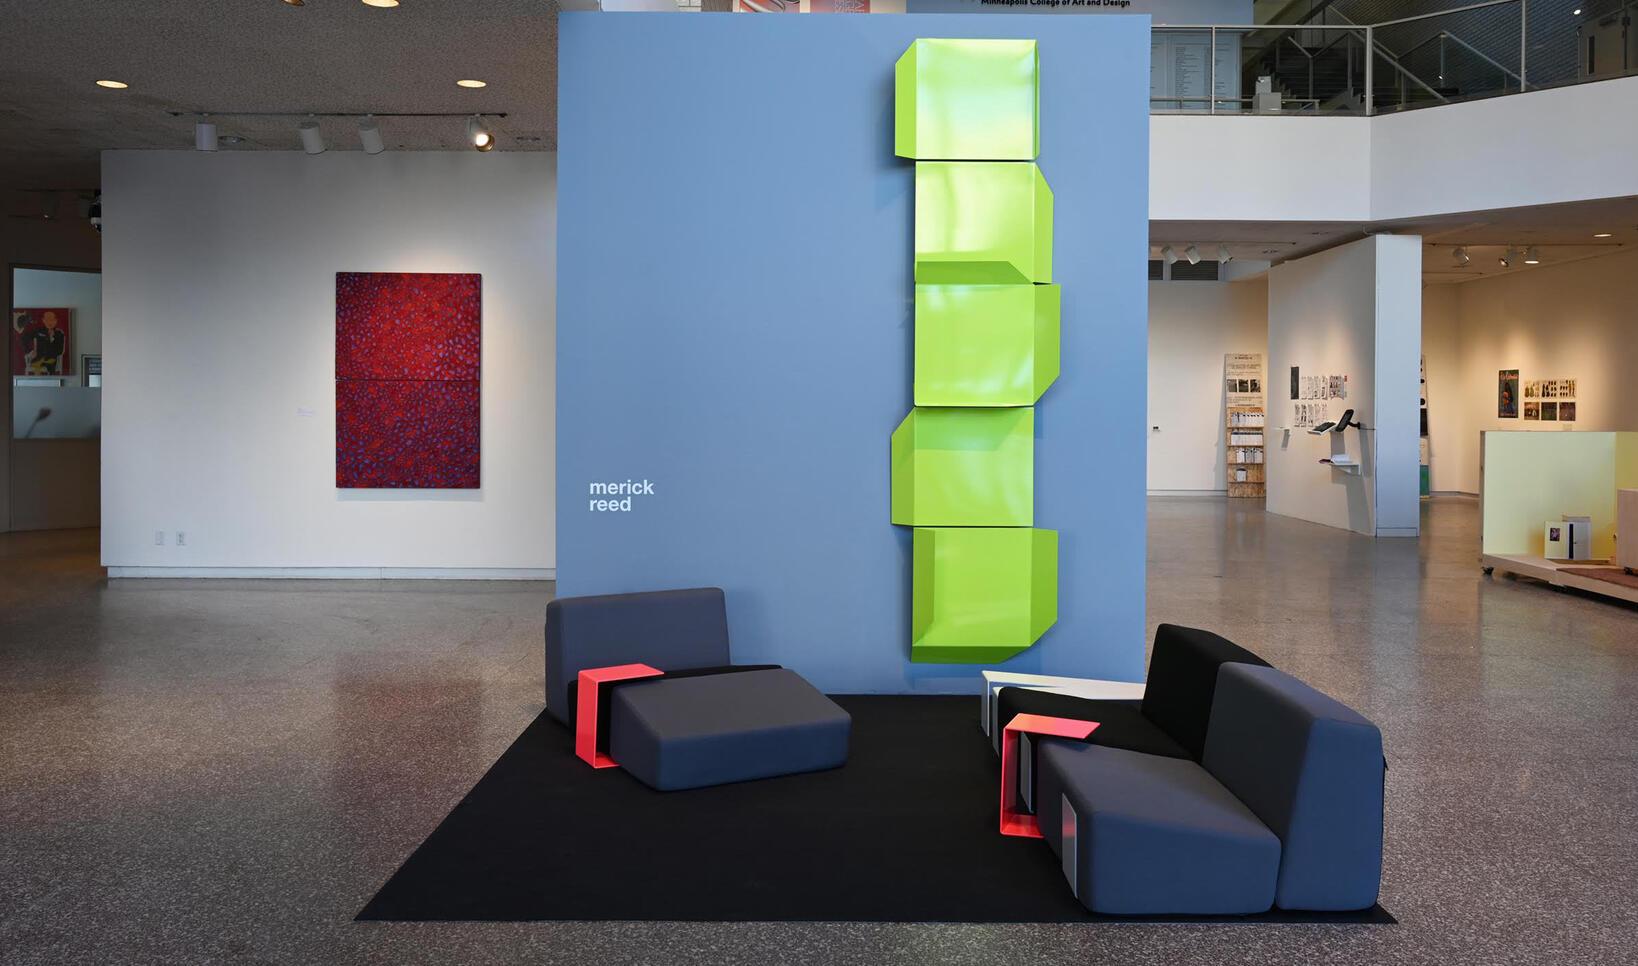 System Furniture Display ; Merick Reed